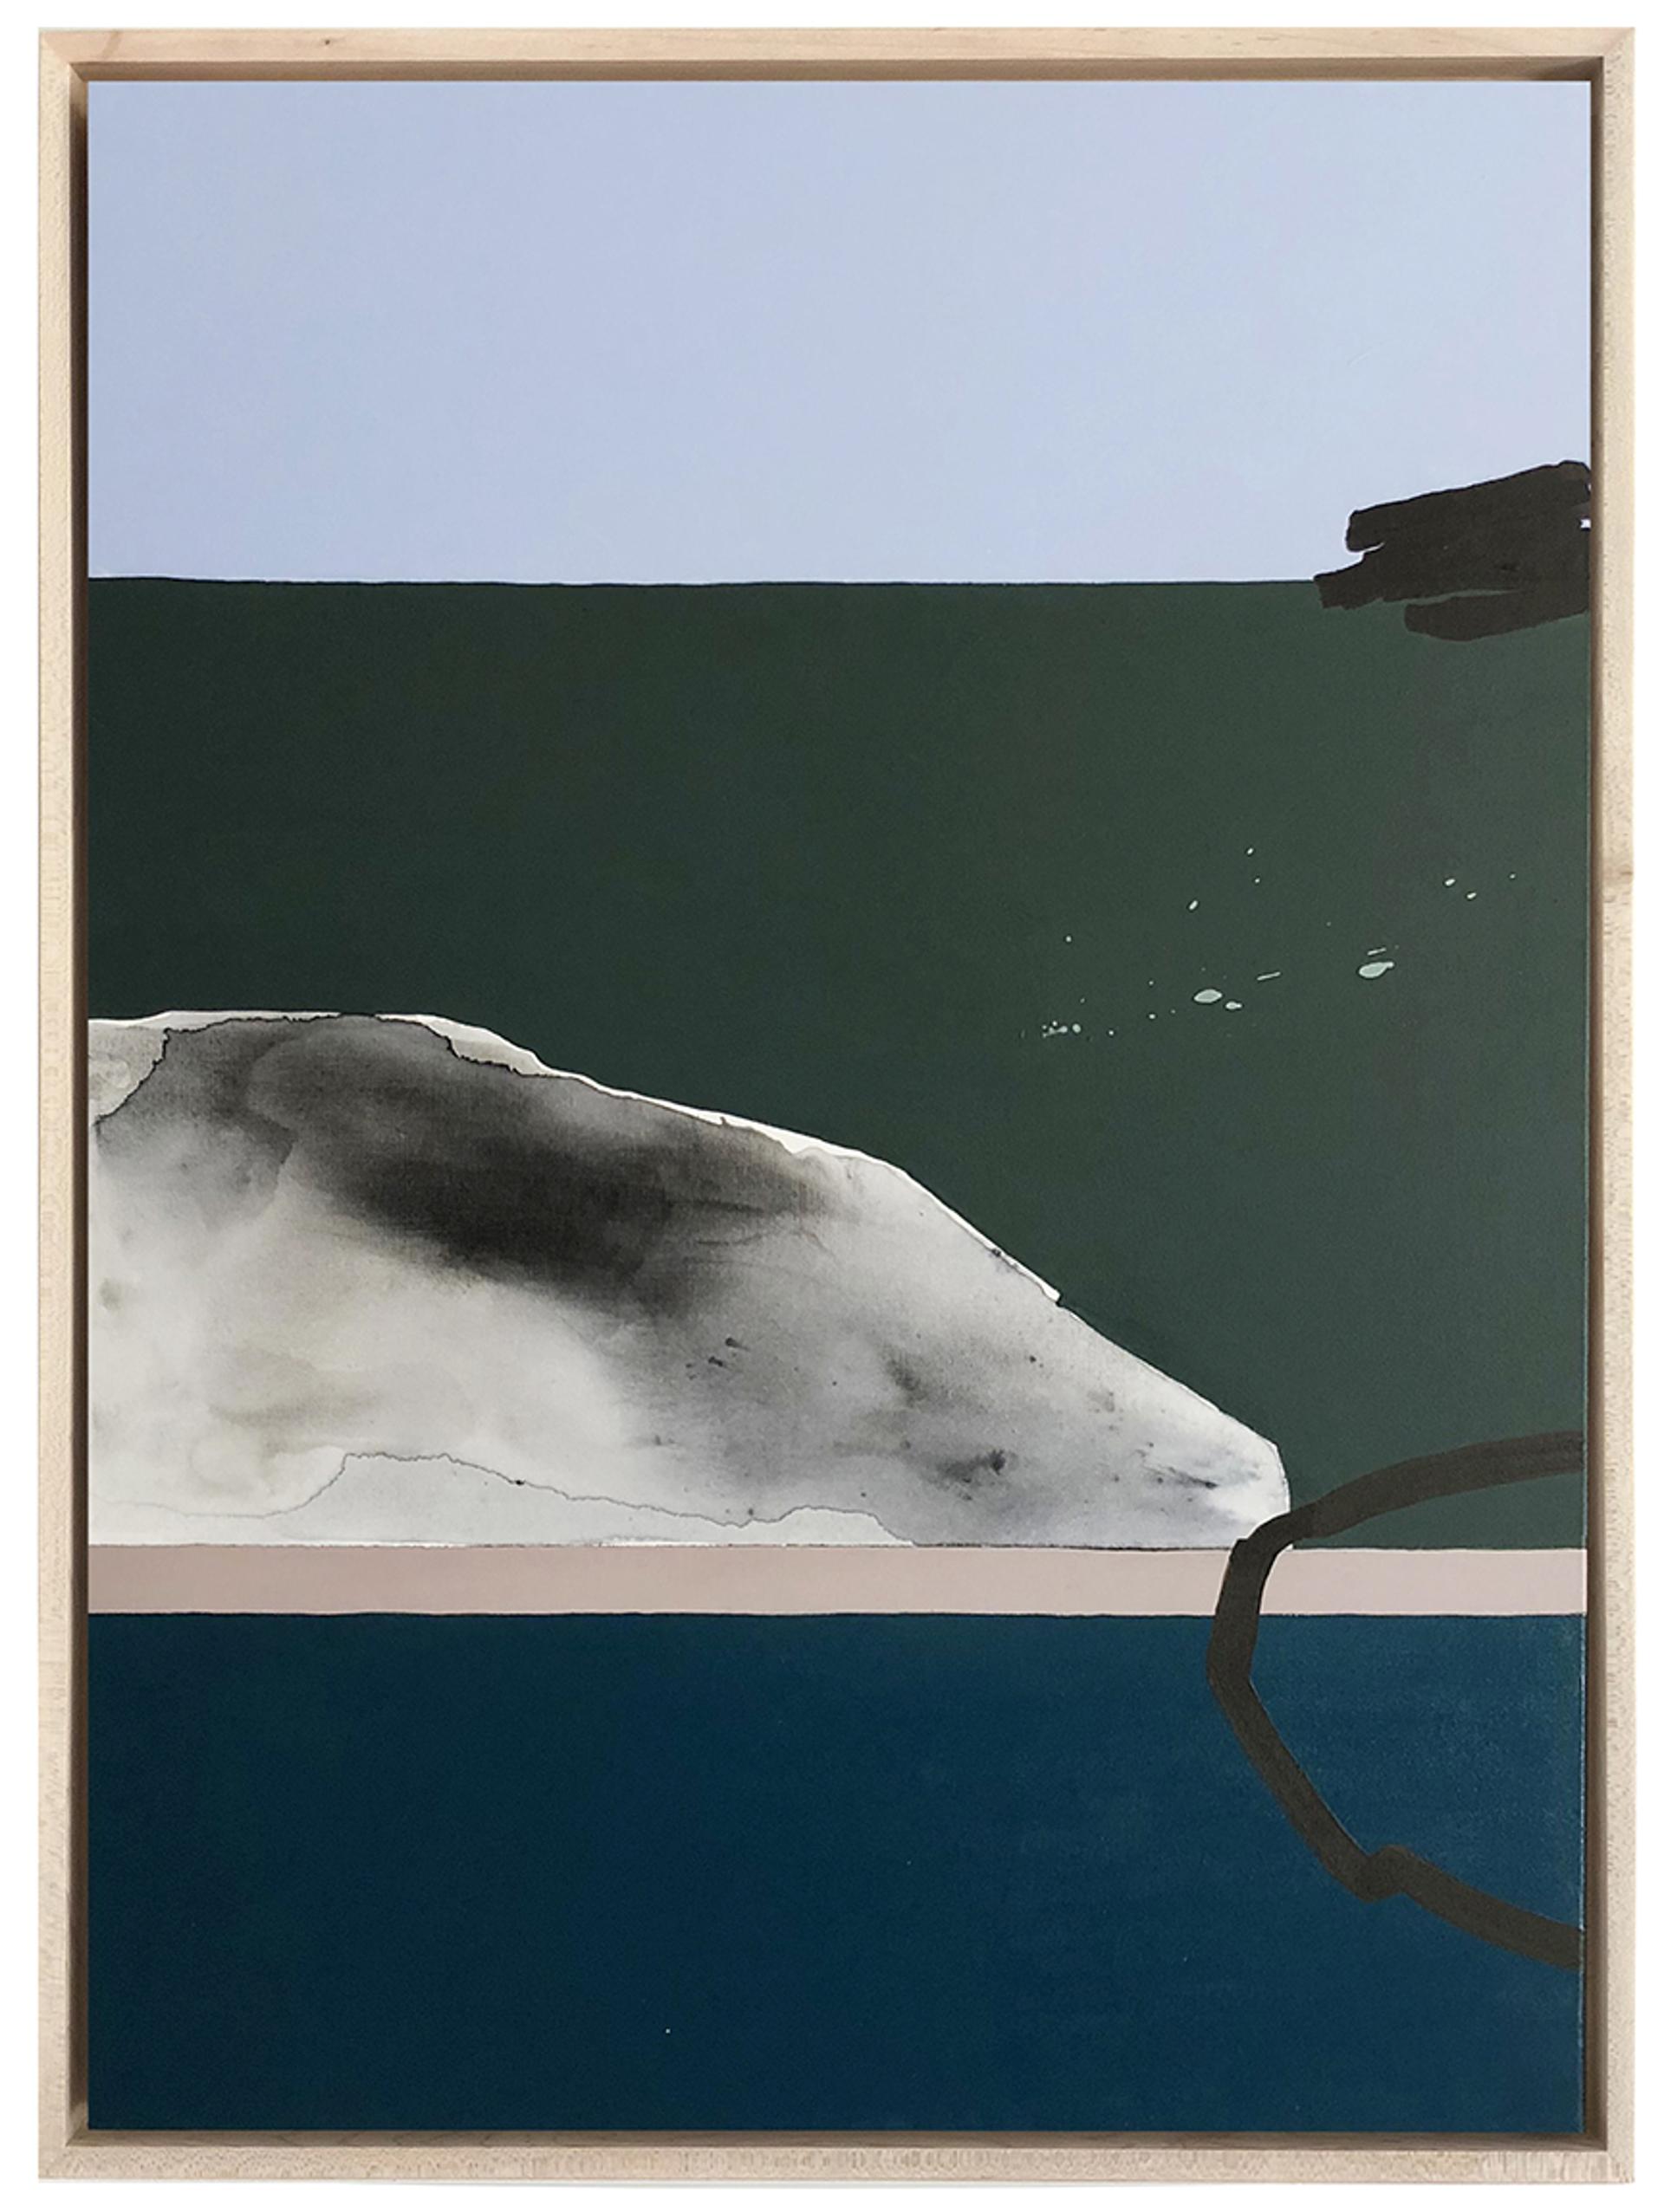 Beyond the Horizon by Karina Bania